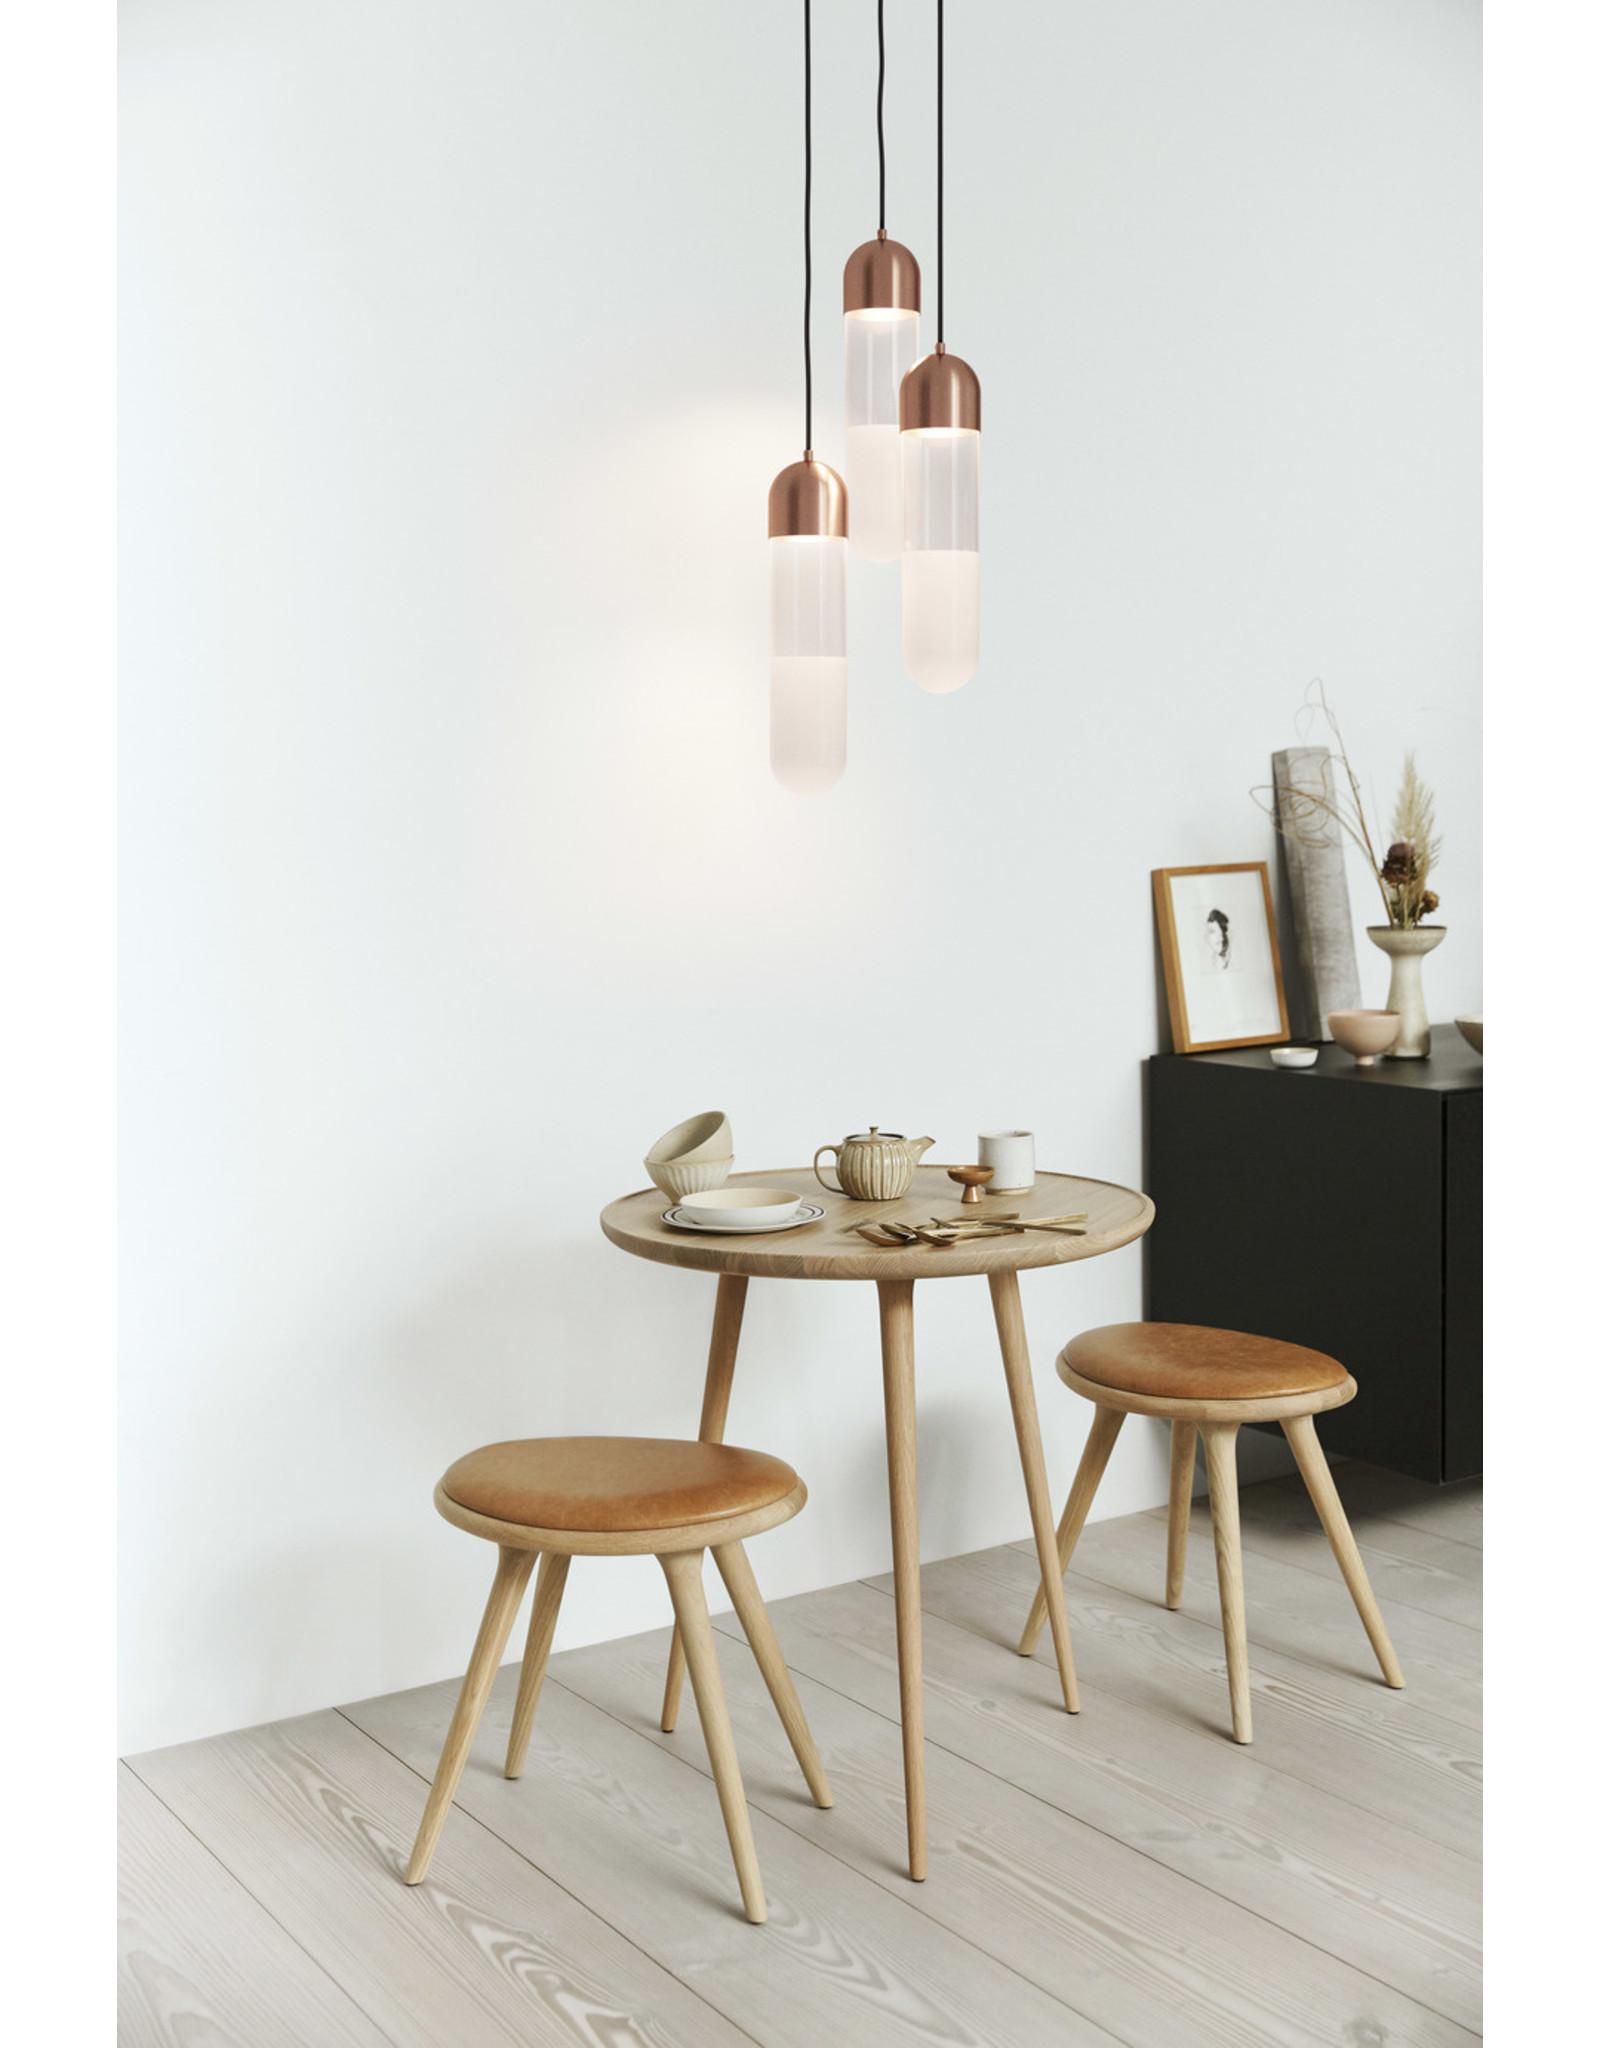 MATER FIREFLY LED PENDANT LAMP IN COPPER